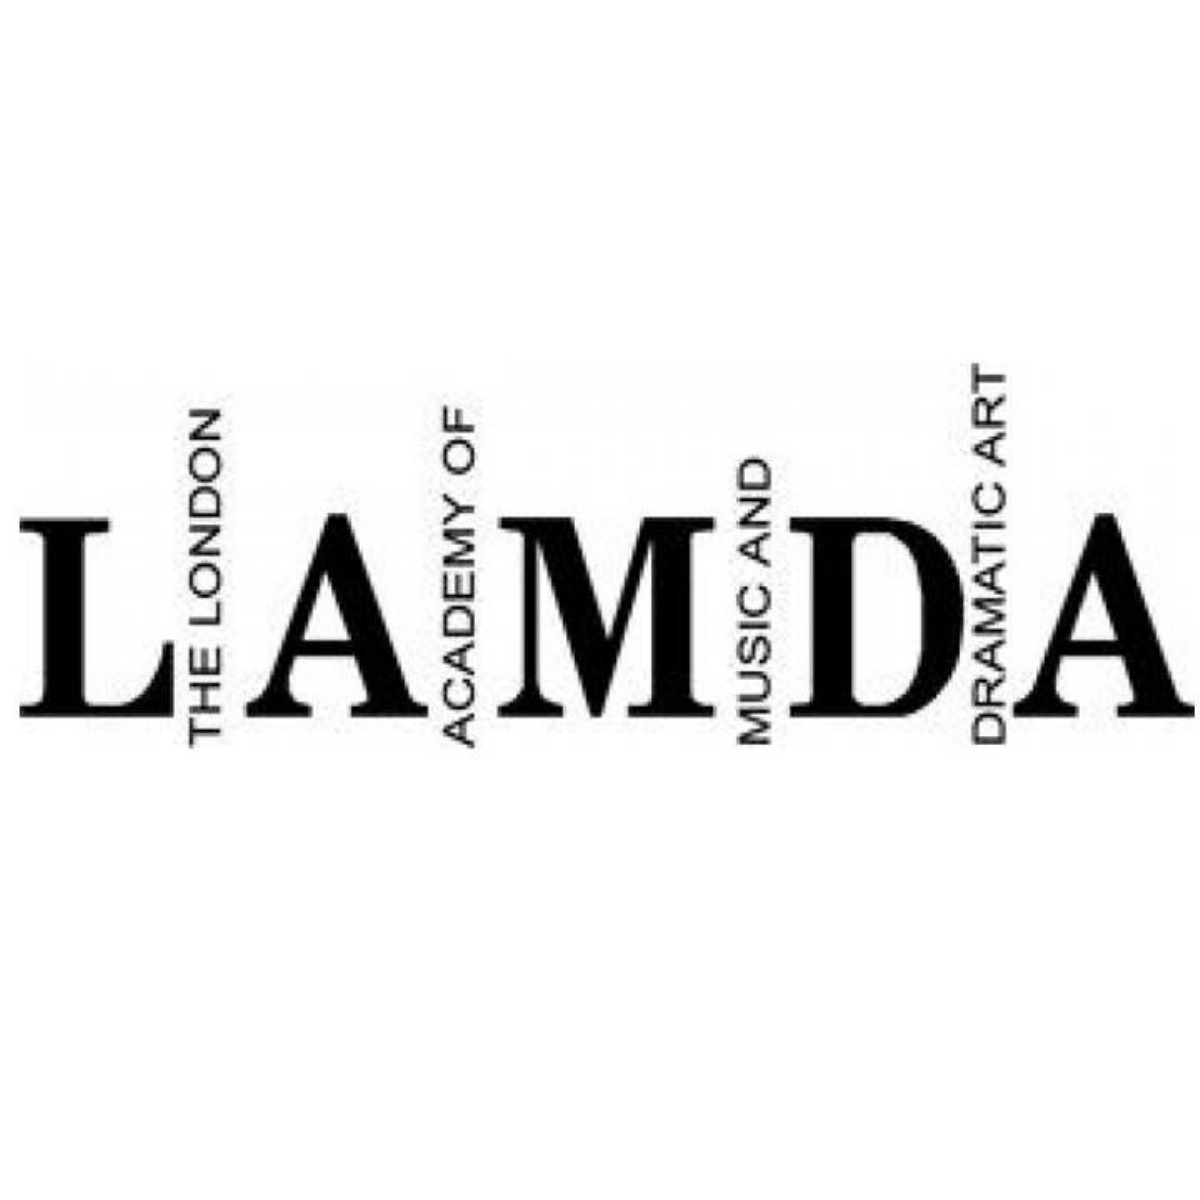 LAMDA logo 2.jpg